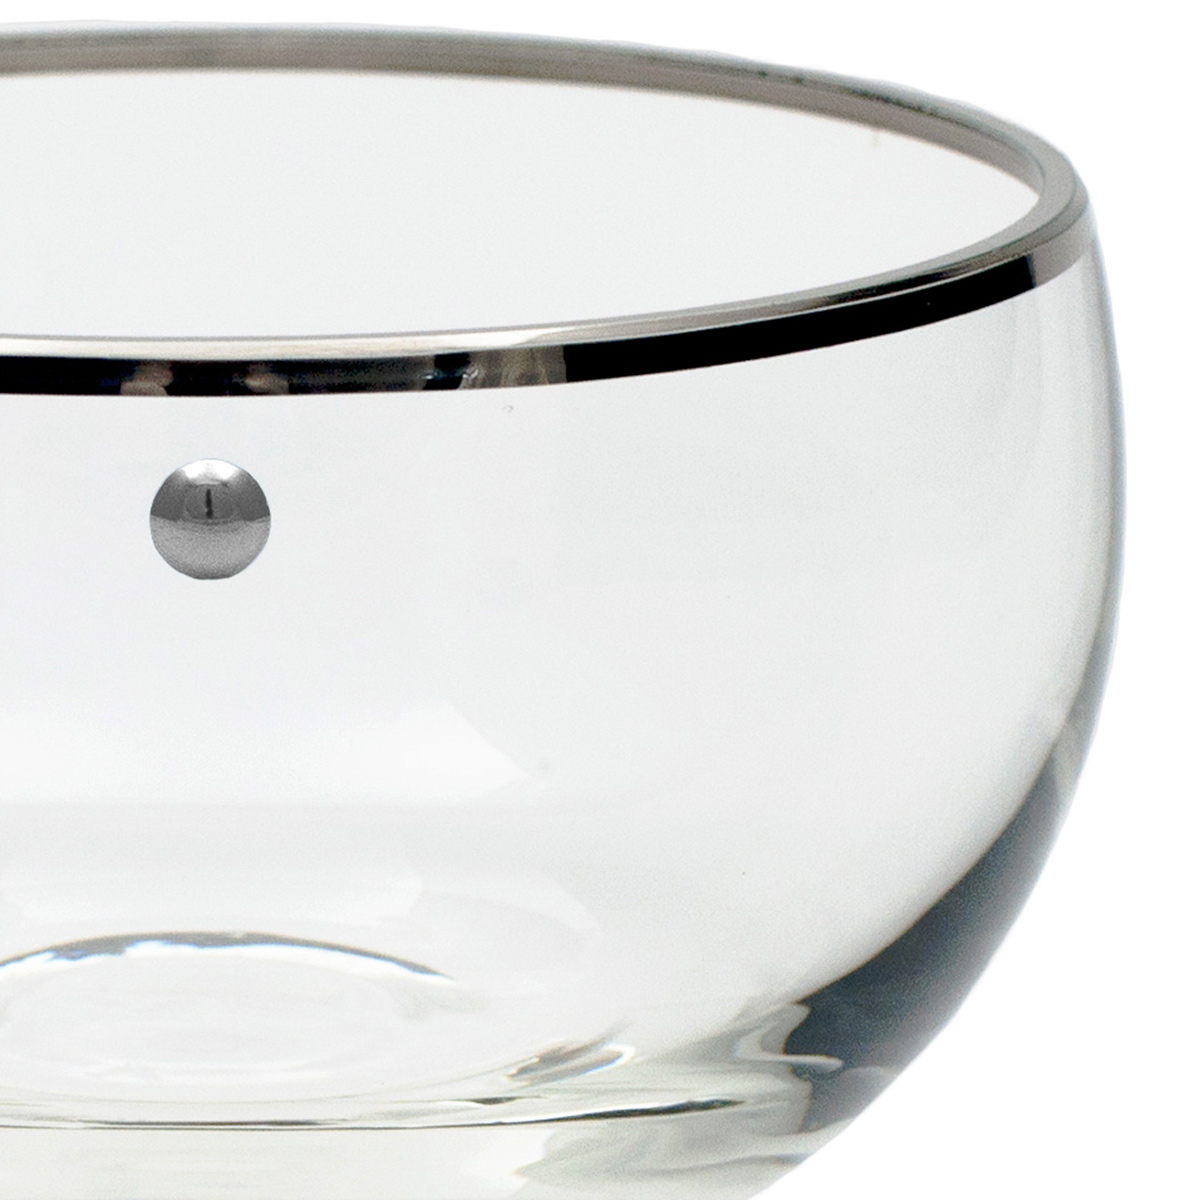 jai-cup-design-crystal-giberto-murano-glass-platinum-venice-luxury-stone-detail-